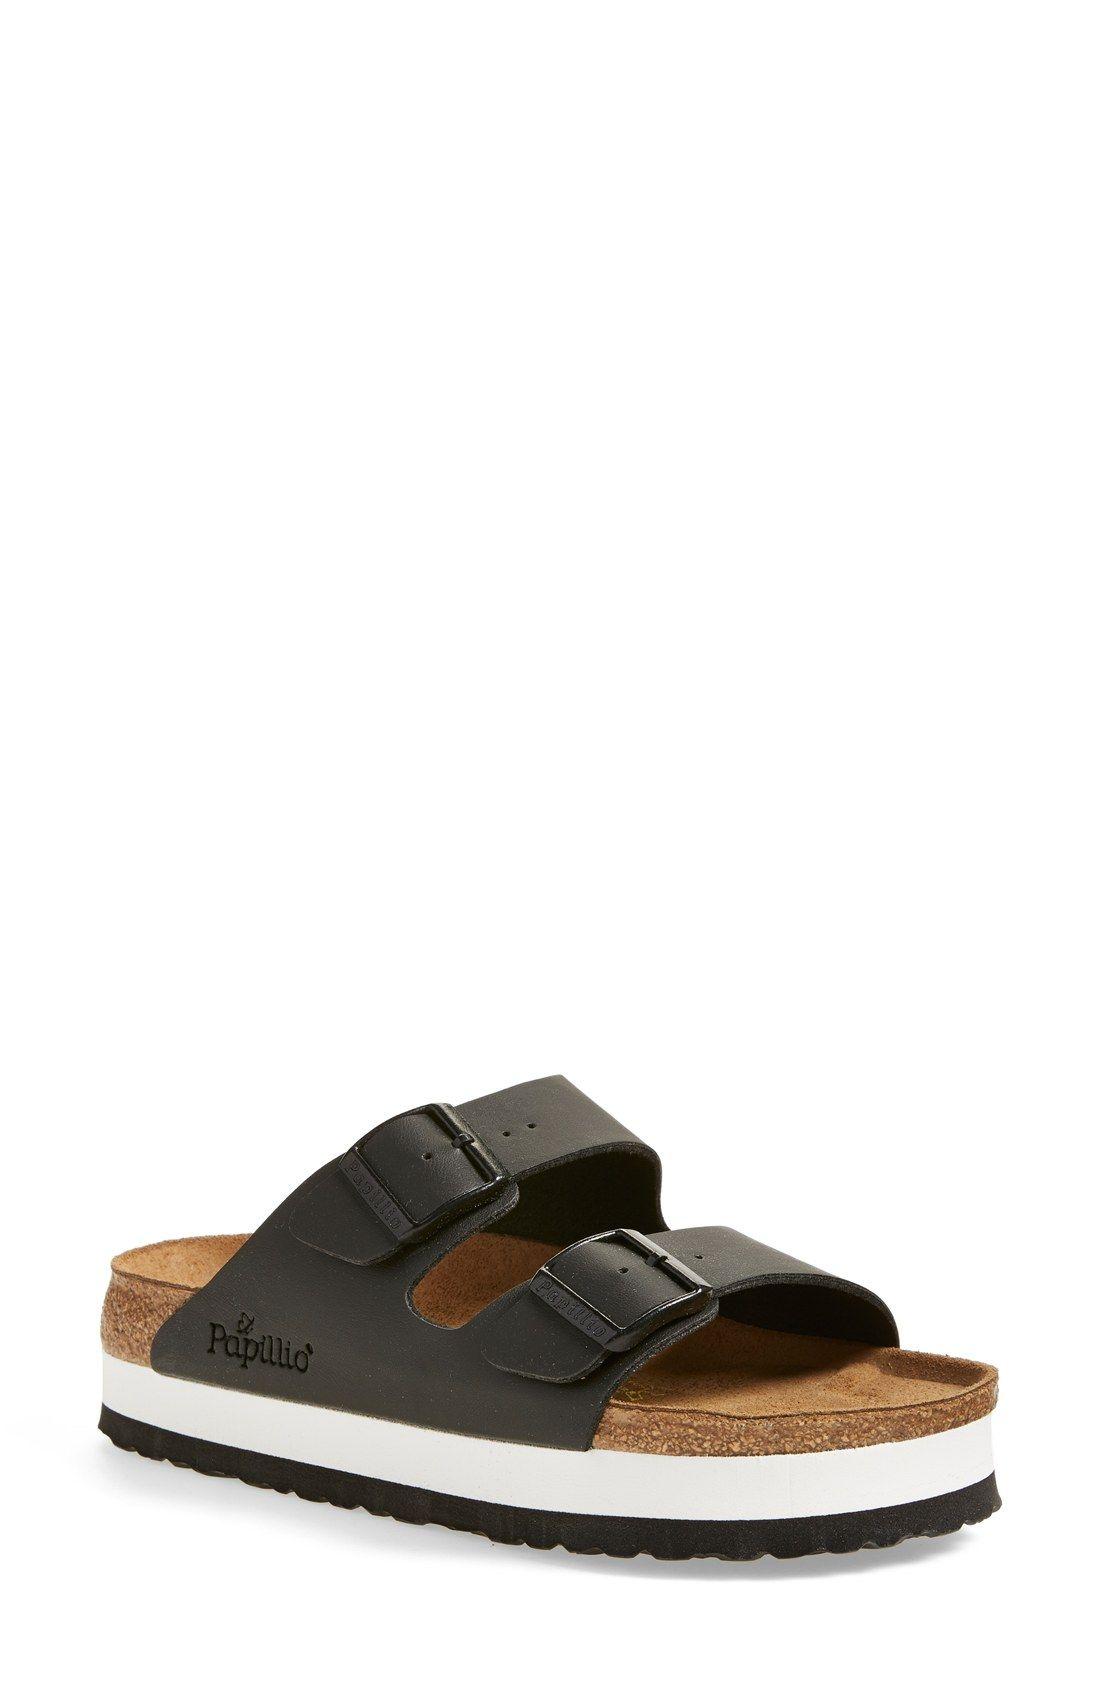 715764d2bf3 Papillio by Birkenstock  Arizona - Birko-Flor  Platform Sandal (Women)